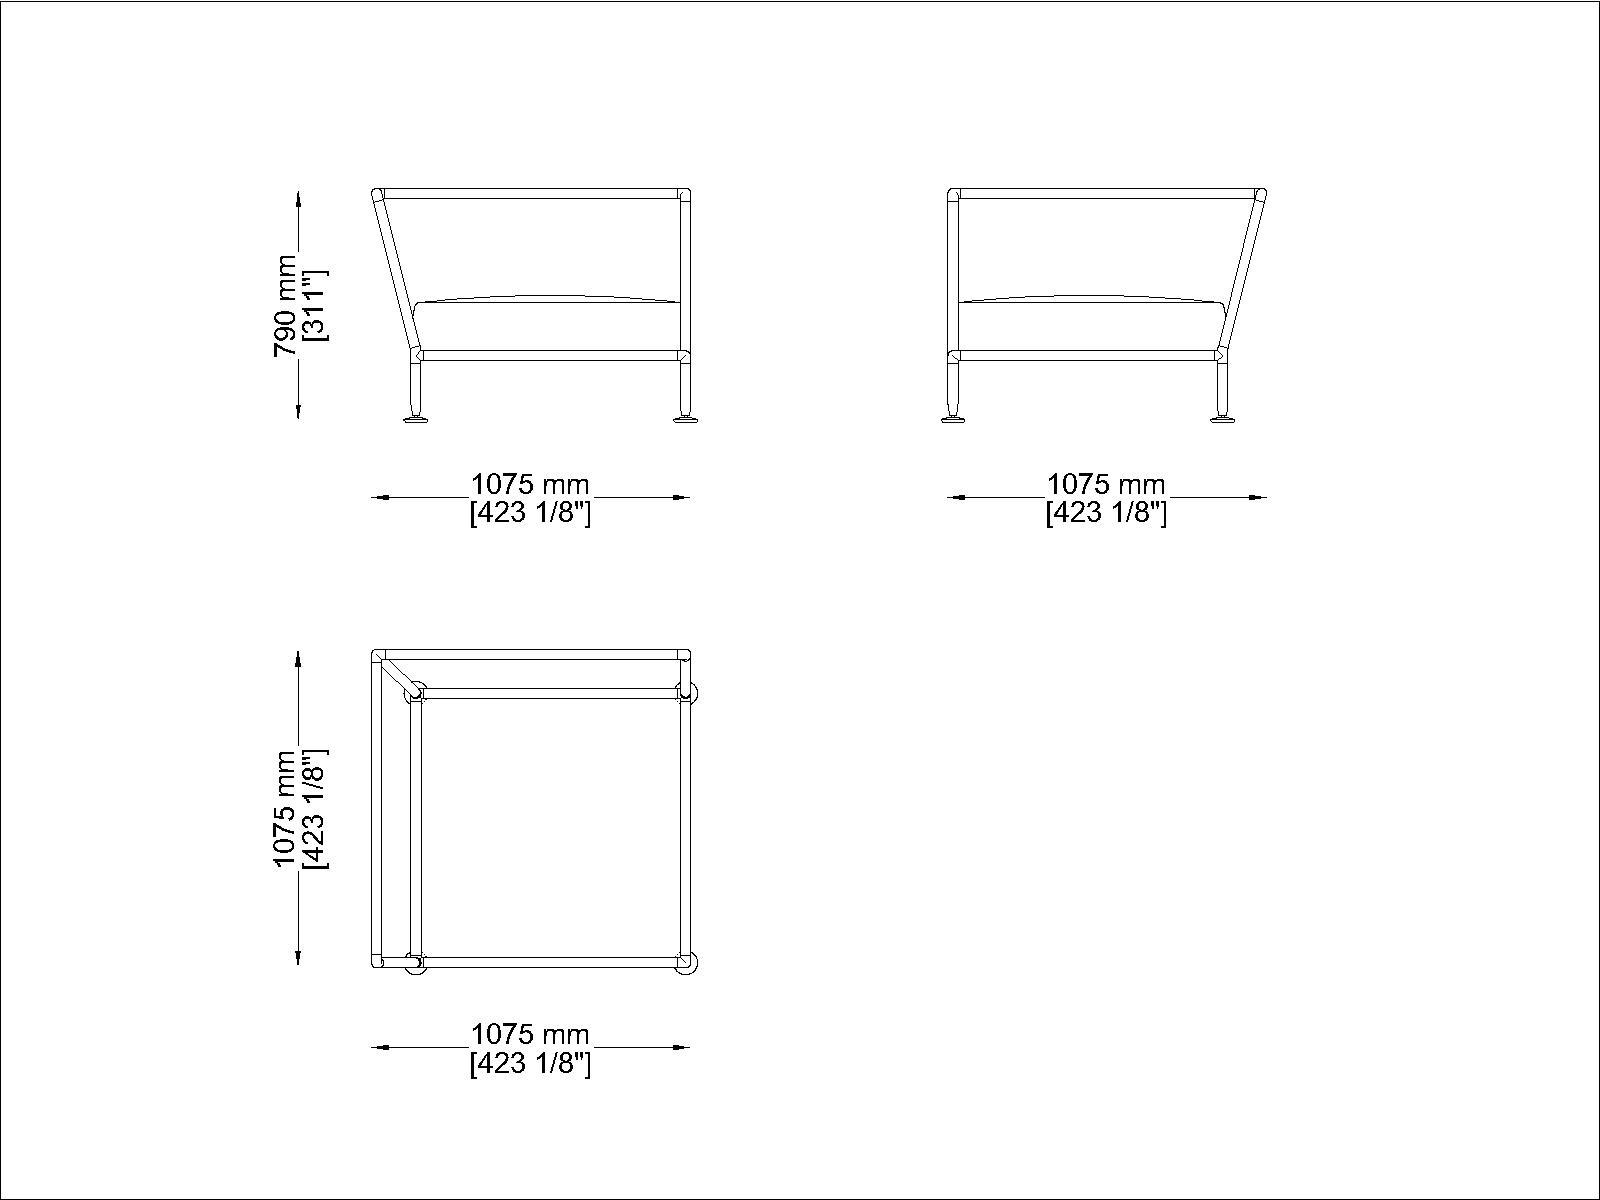 Coro Nest 90 Sofa 1075 x 1075 x 790 mm mit Stabrücken abnehmbarer Stoffbezug Rahmen Edelstahl satiniert